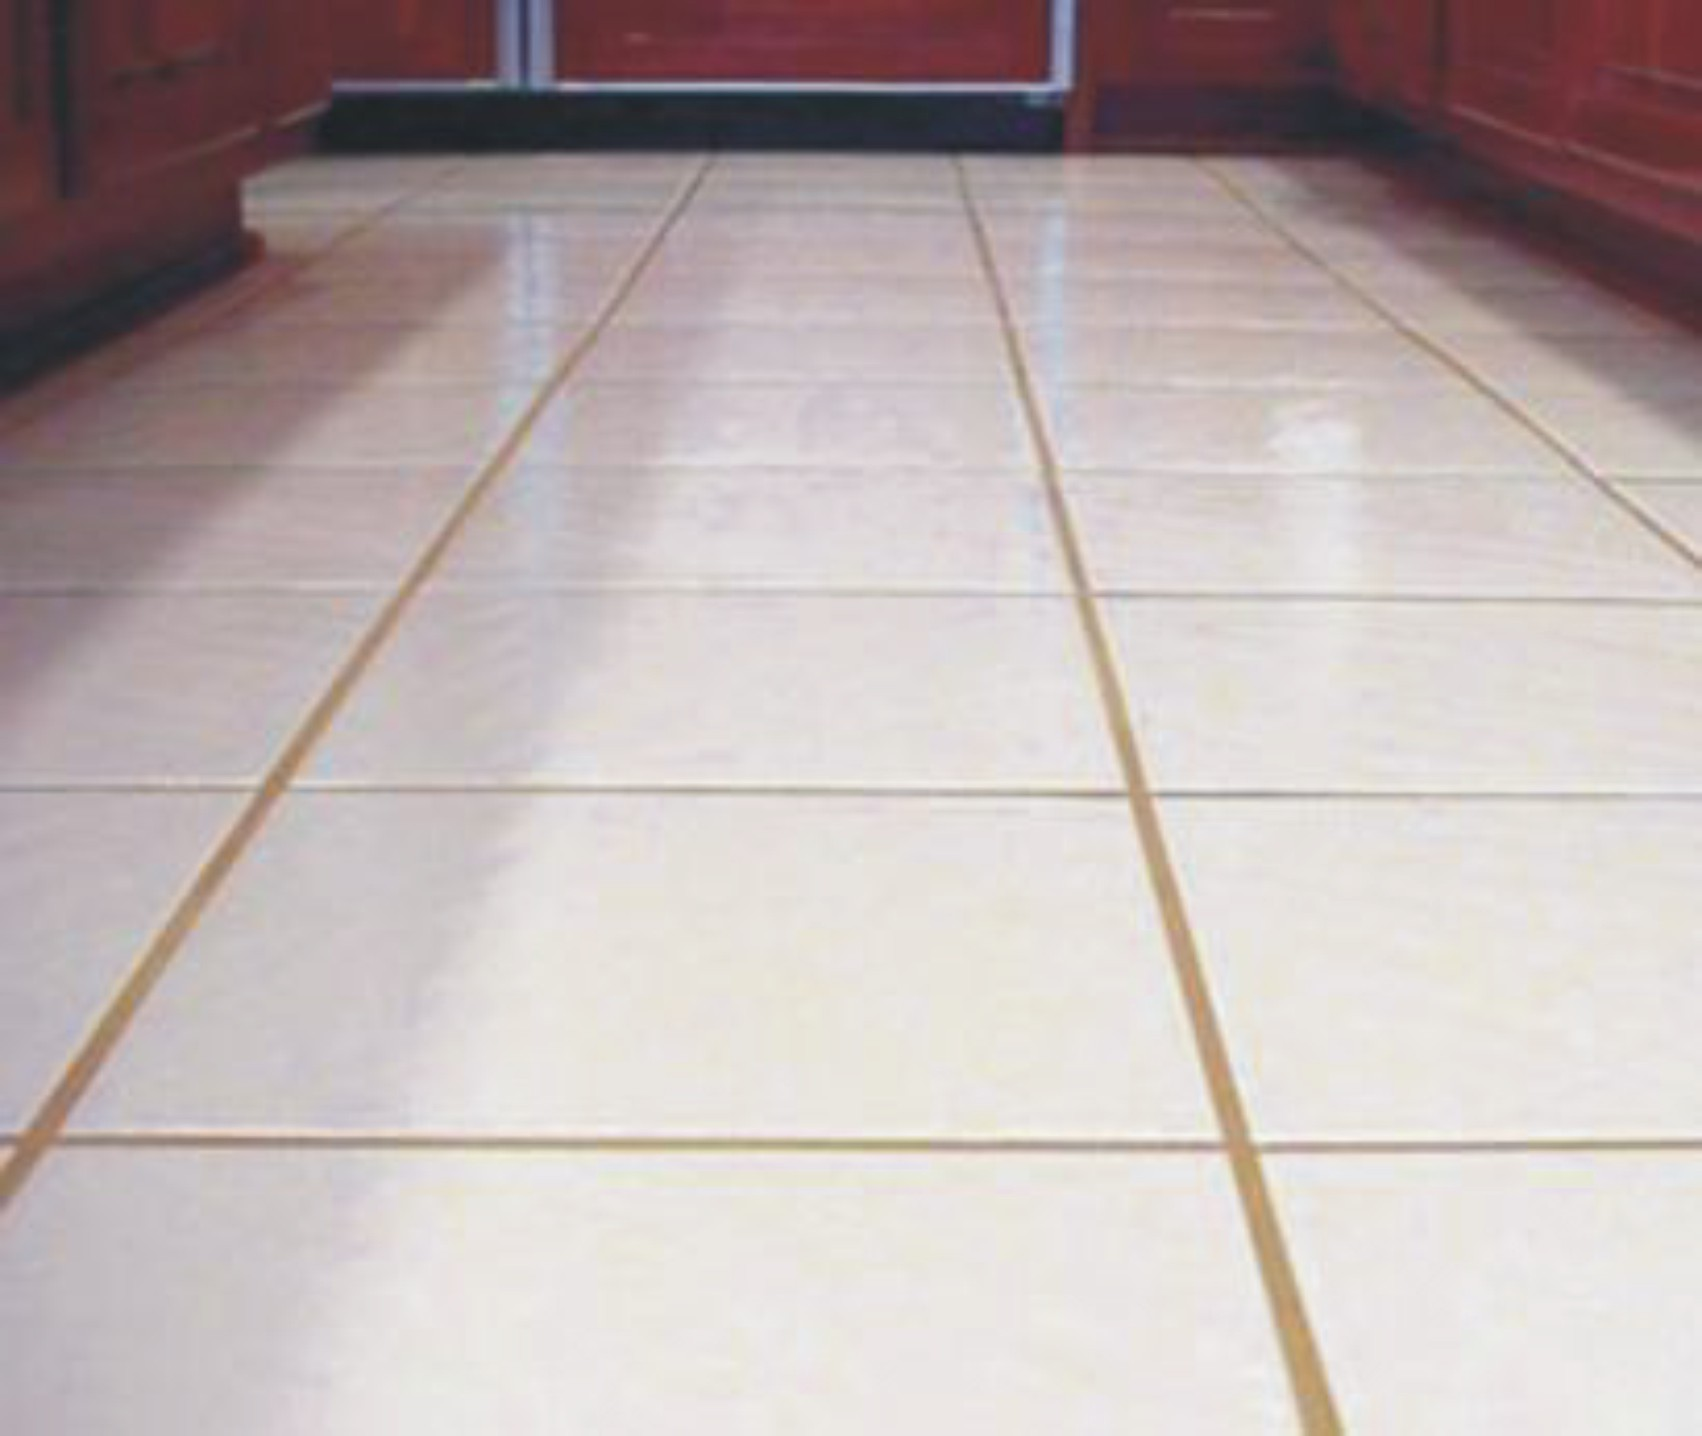 How to clean floor grout between tiles gallery home flooring design how to clean grout between ceramic floor tiles choice image home clean floor grout between tiles doublecrazyfo Gallery